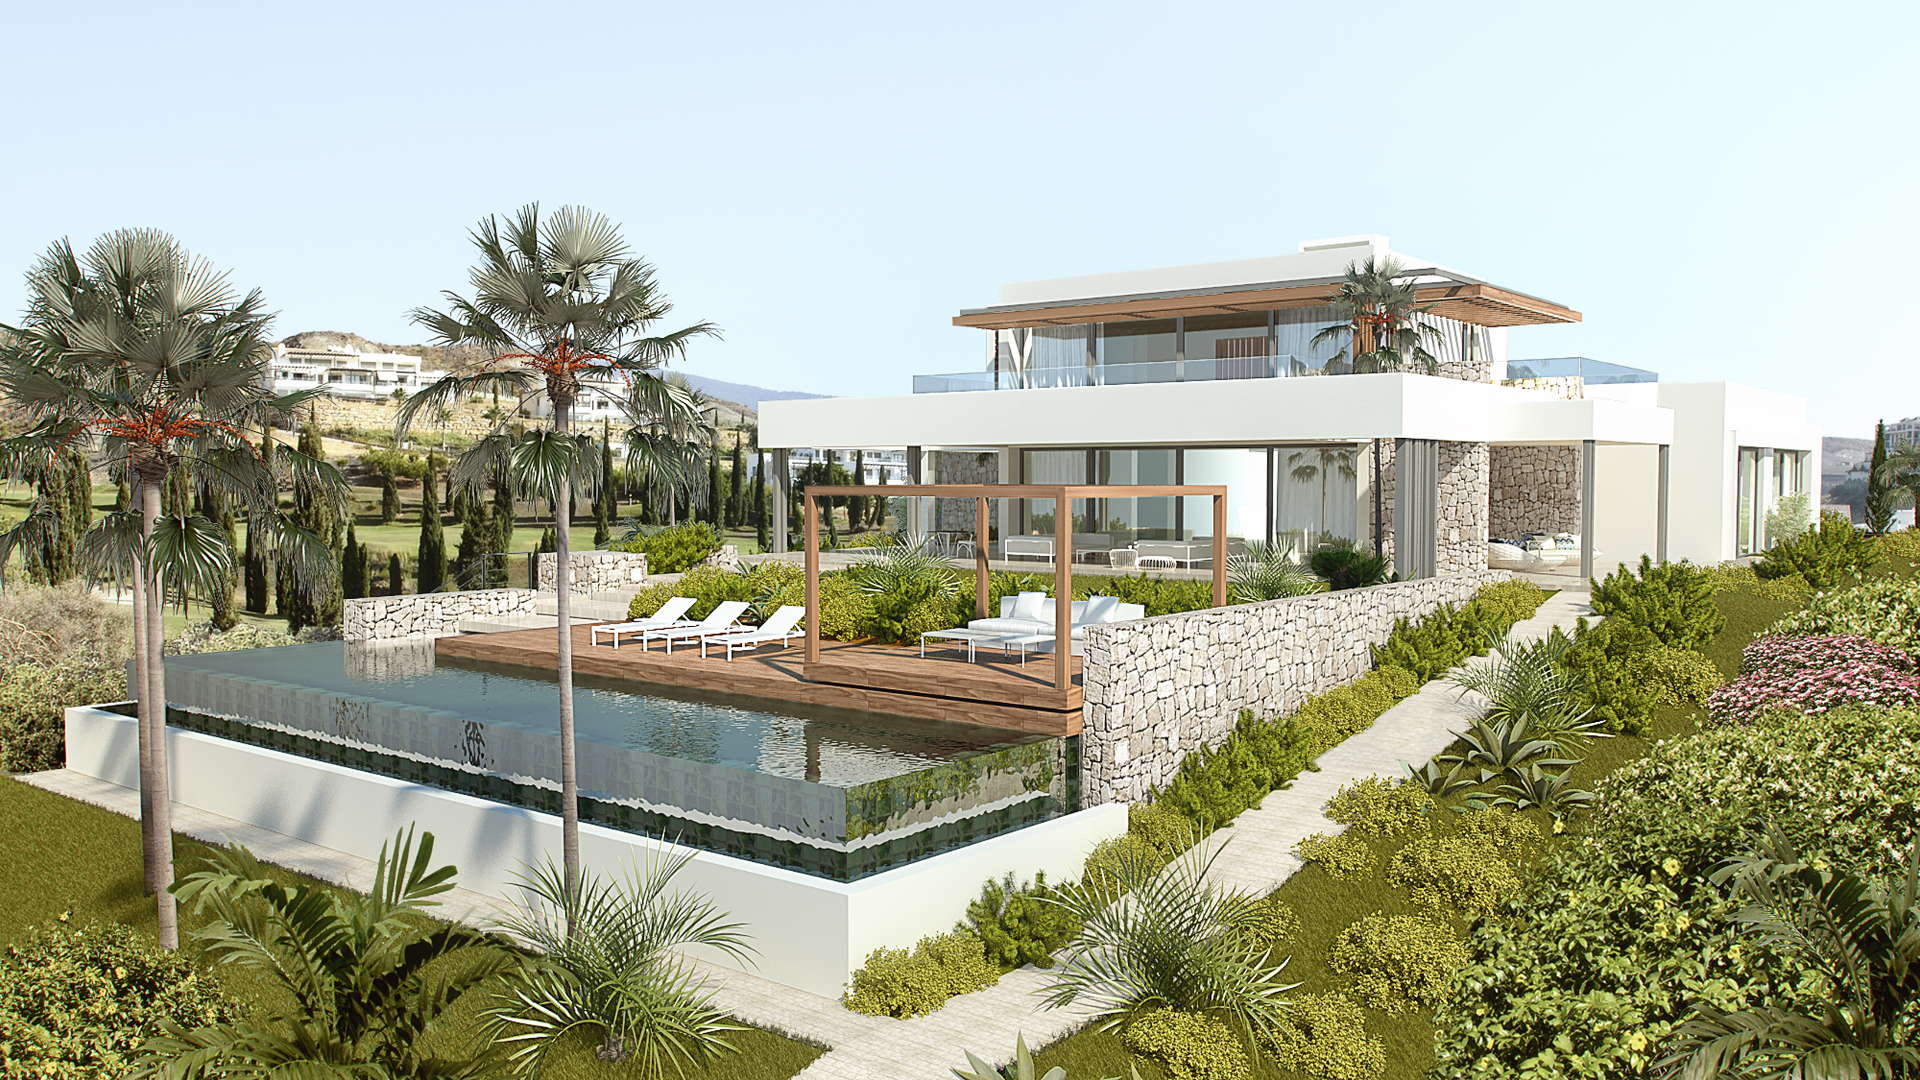 Los Flamingos Golf modern high quality villa under construction.